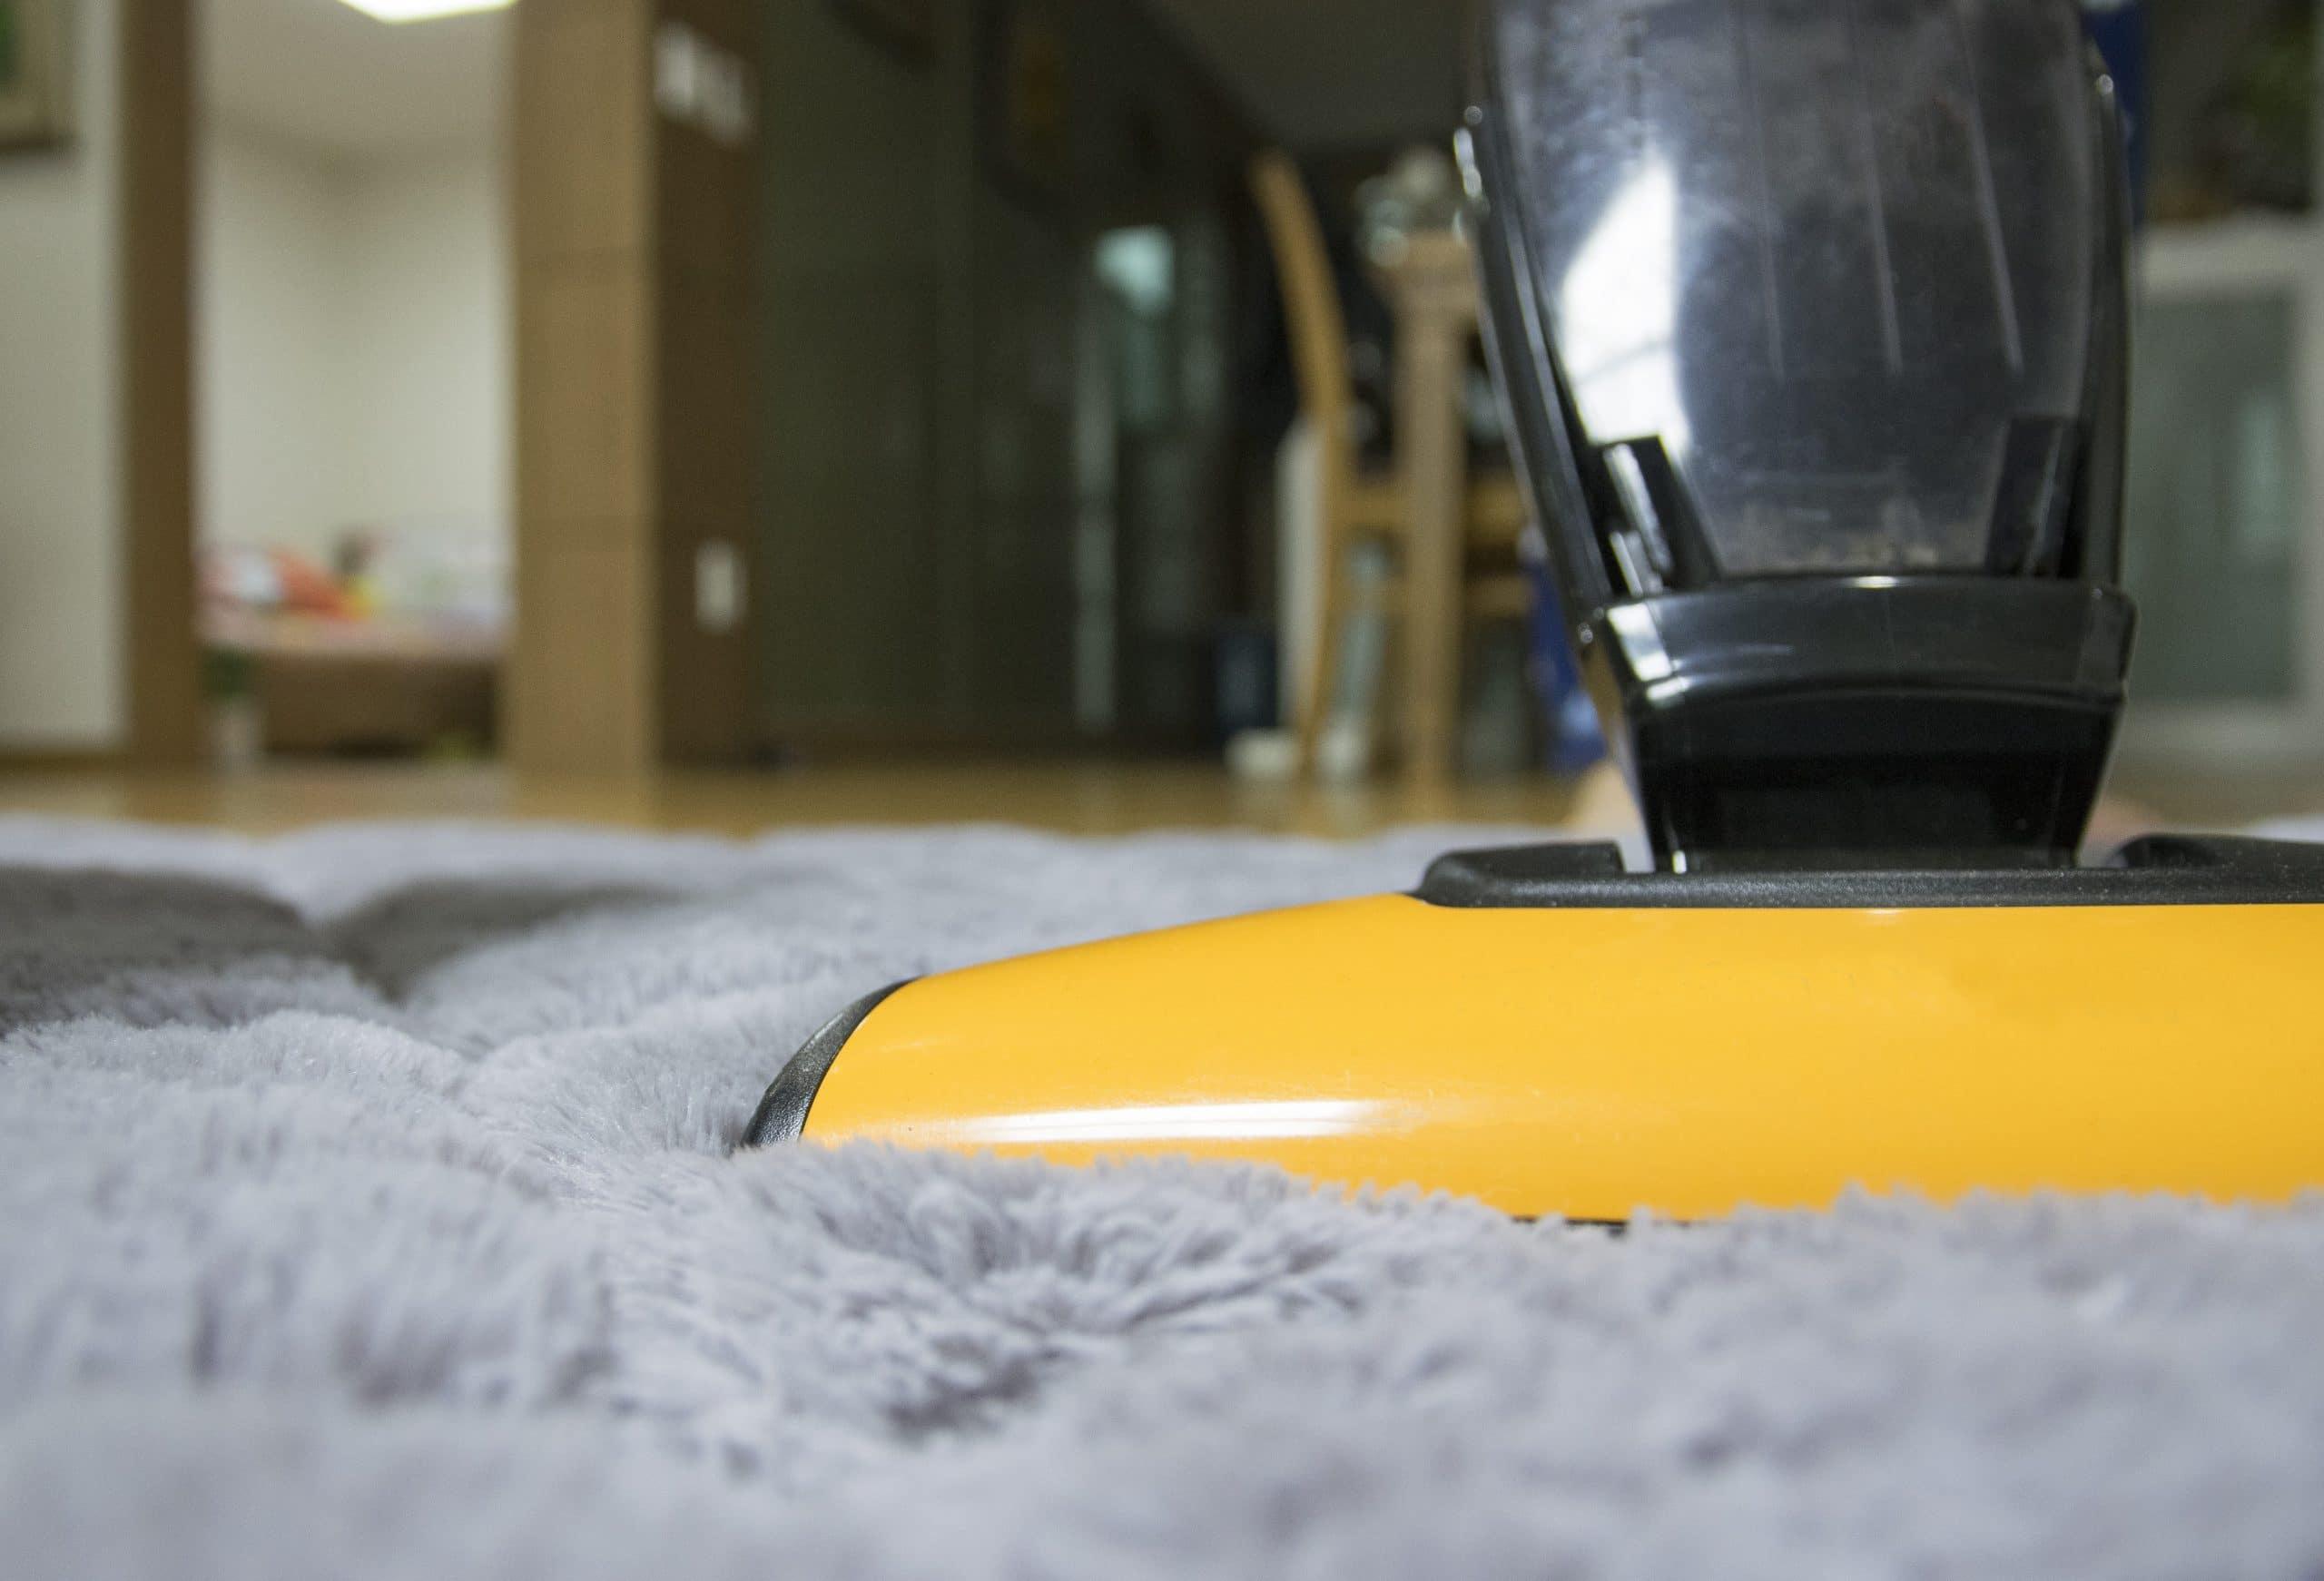 hoovering floor